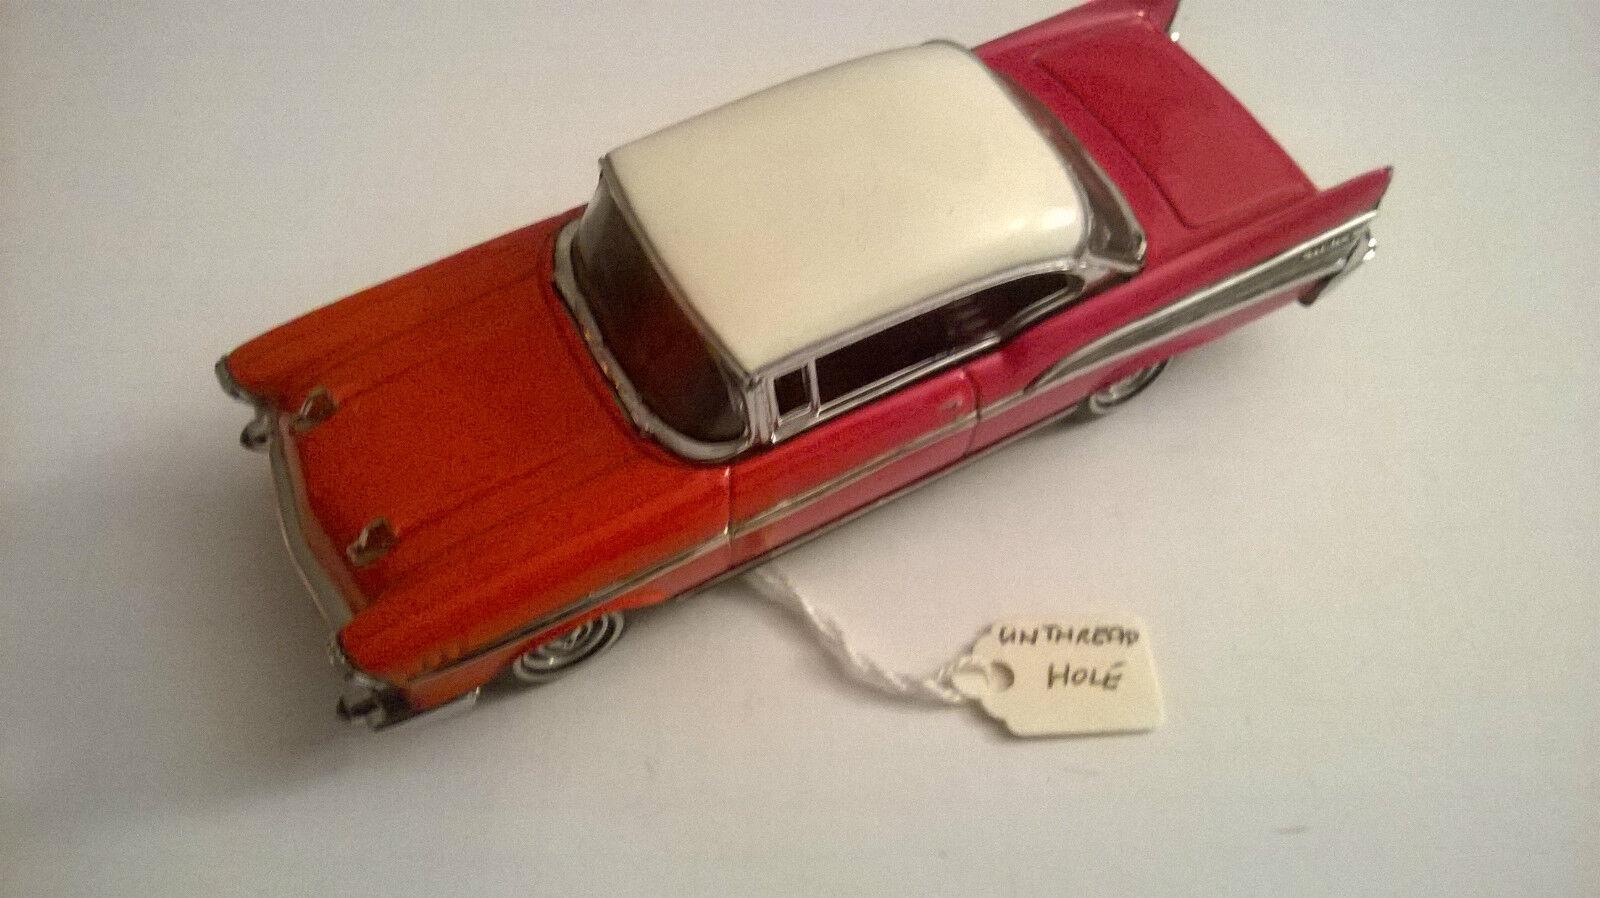 RARE PrePro DY-02 Chevrolet, red   white, bigger gap, Matchbox, Dinky, no Box